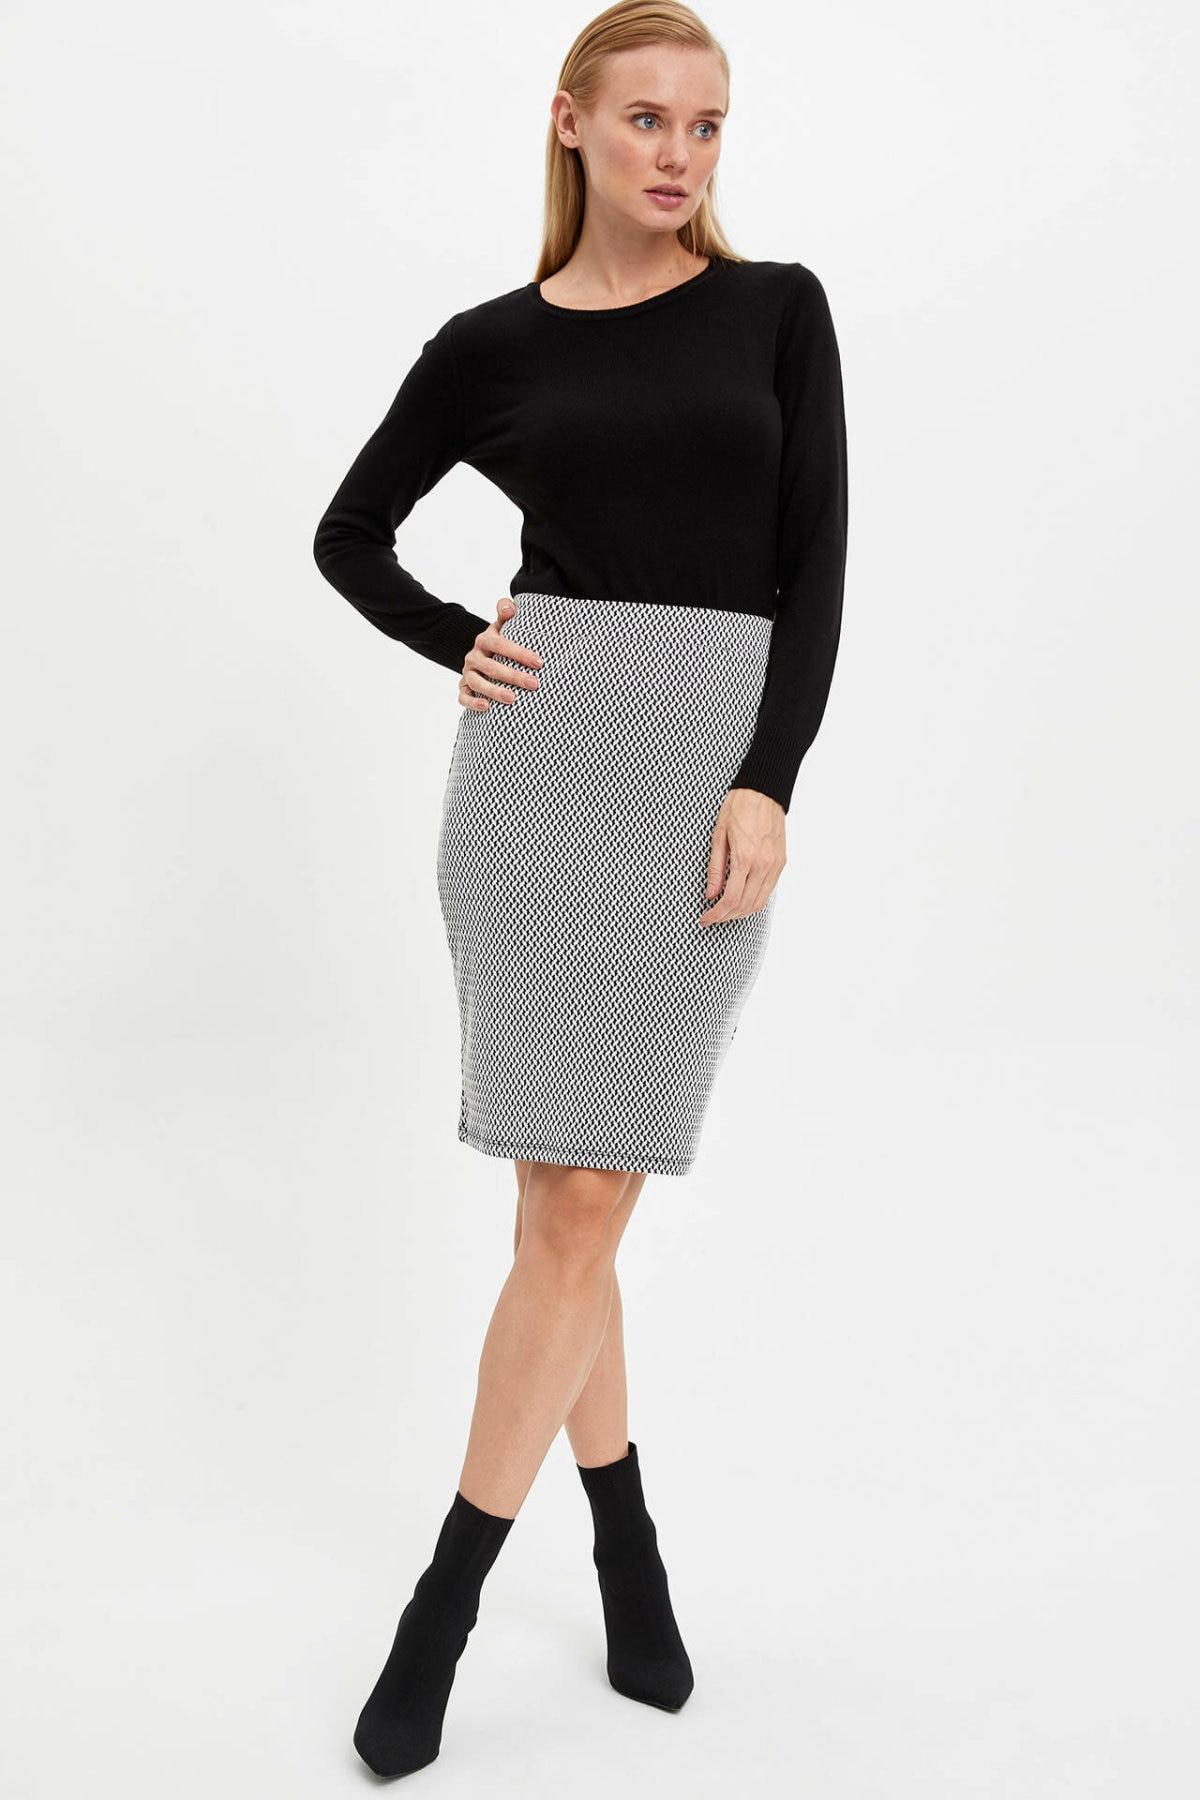 DeFacto Skirt Woman Office Plaid Pattern Pencil High Waist Skirts  Skinny Sexy Midi Skirt Womens Autumn Winter New - M1088AZ19AU